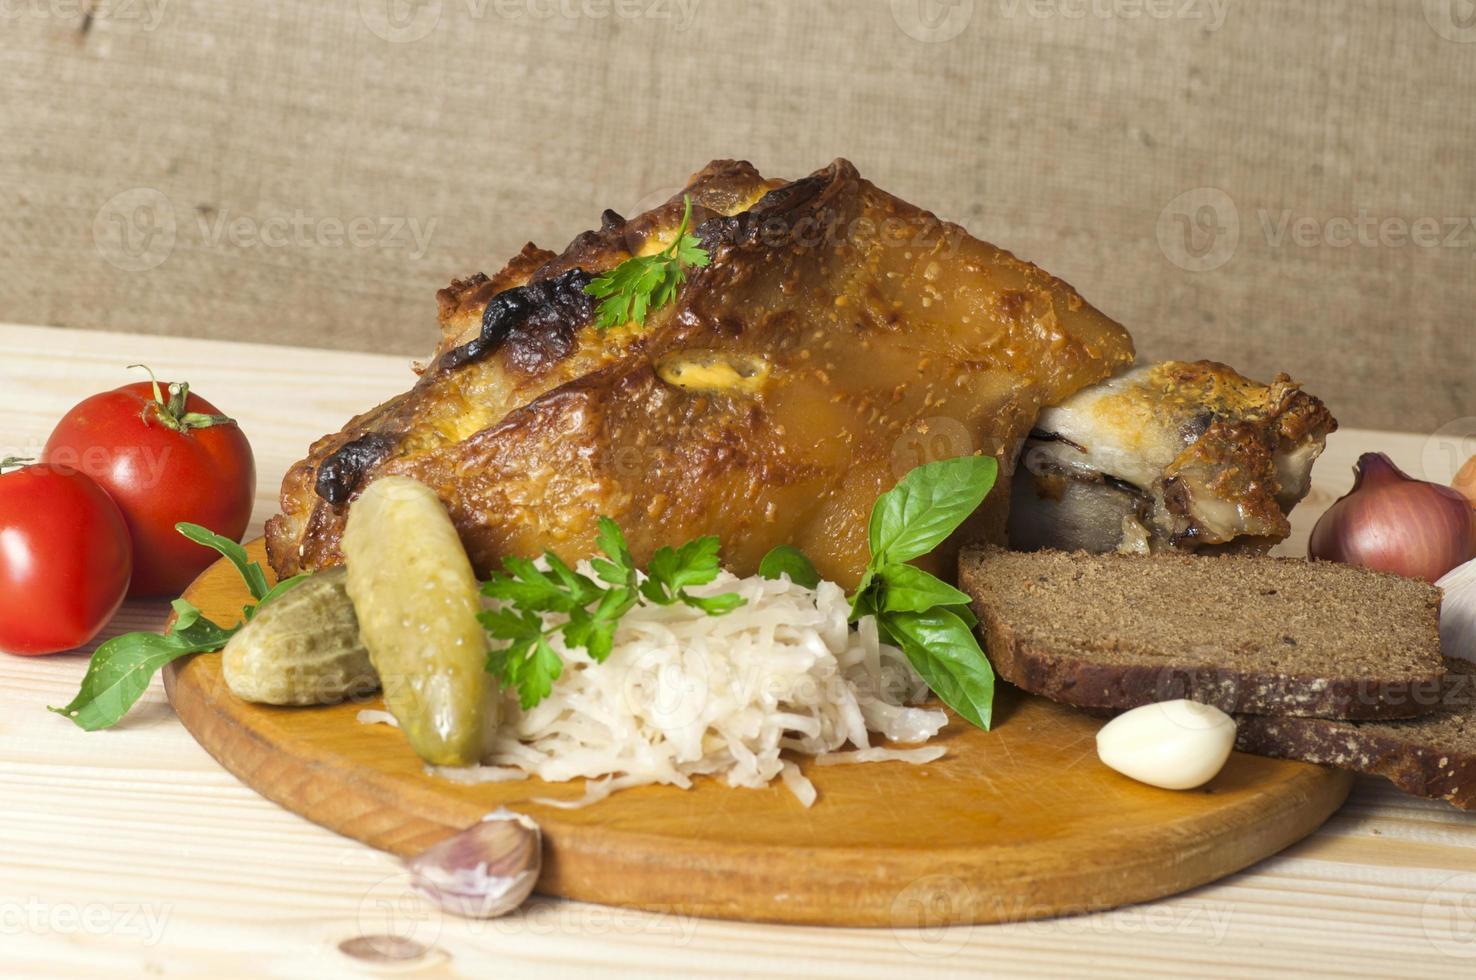 pierna de cerdo asada servida con chucrut foto